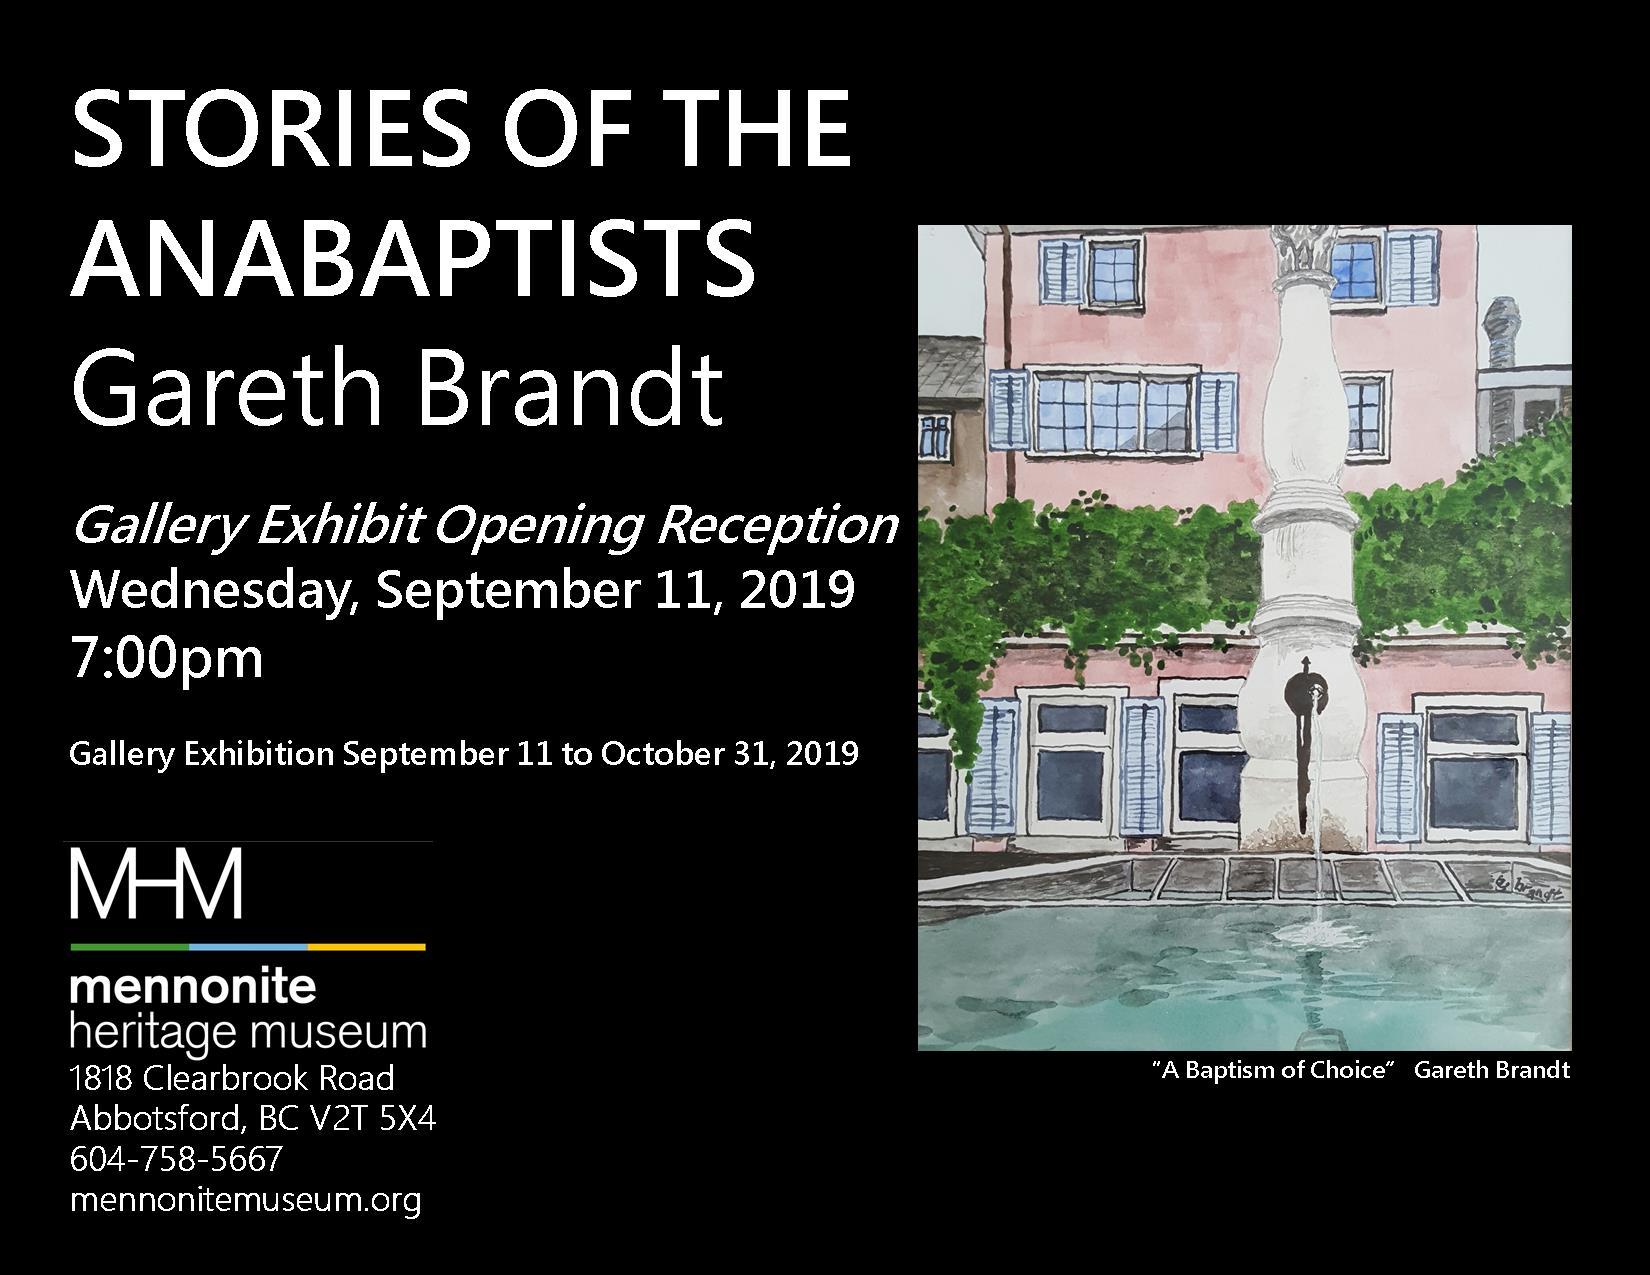 2019 09 Gareth Brandt Gallery Exhibit Opening Reception Poster